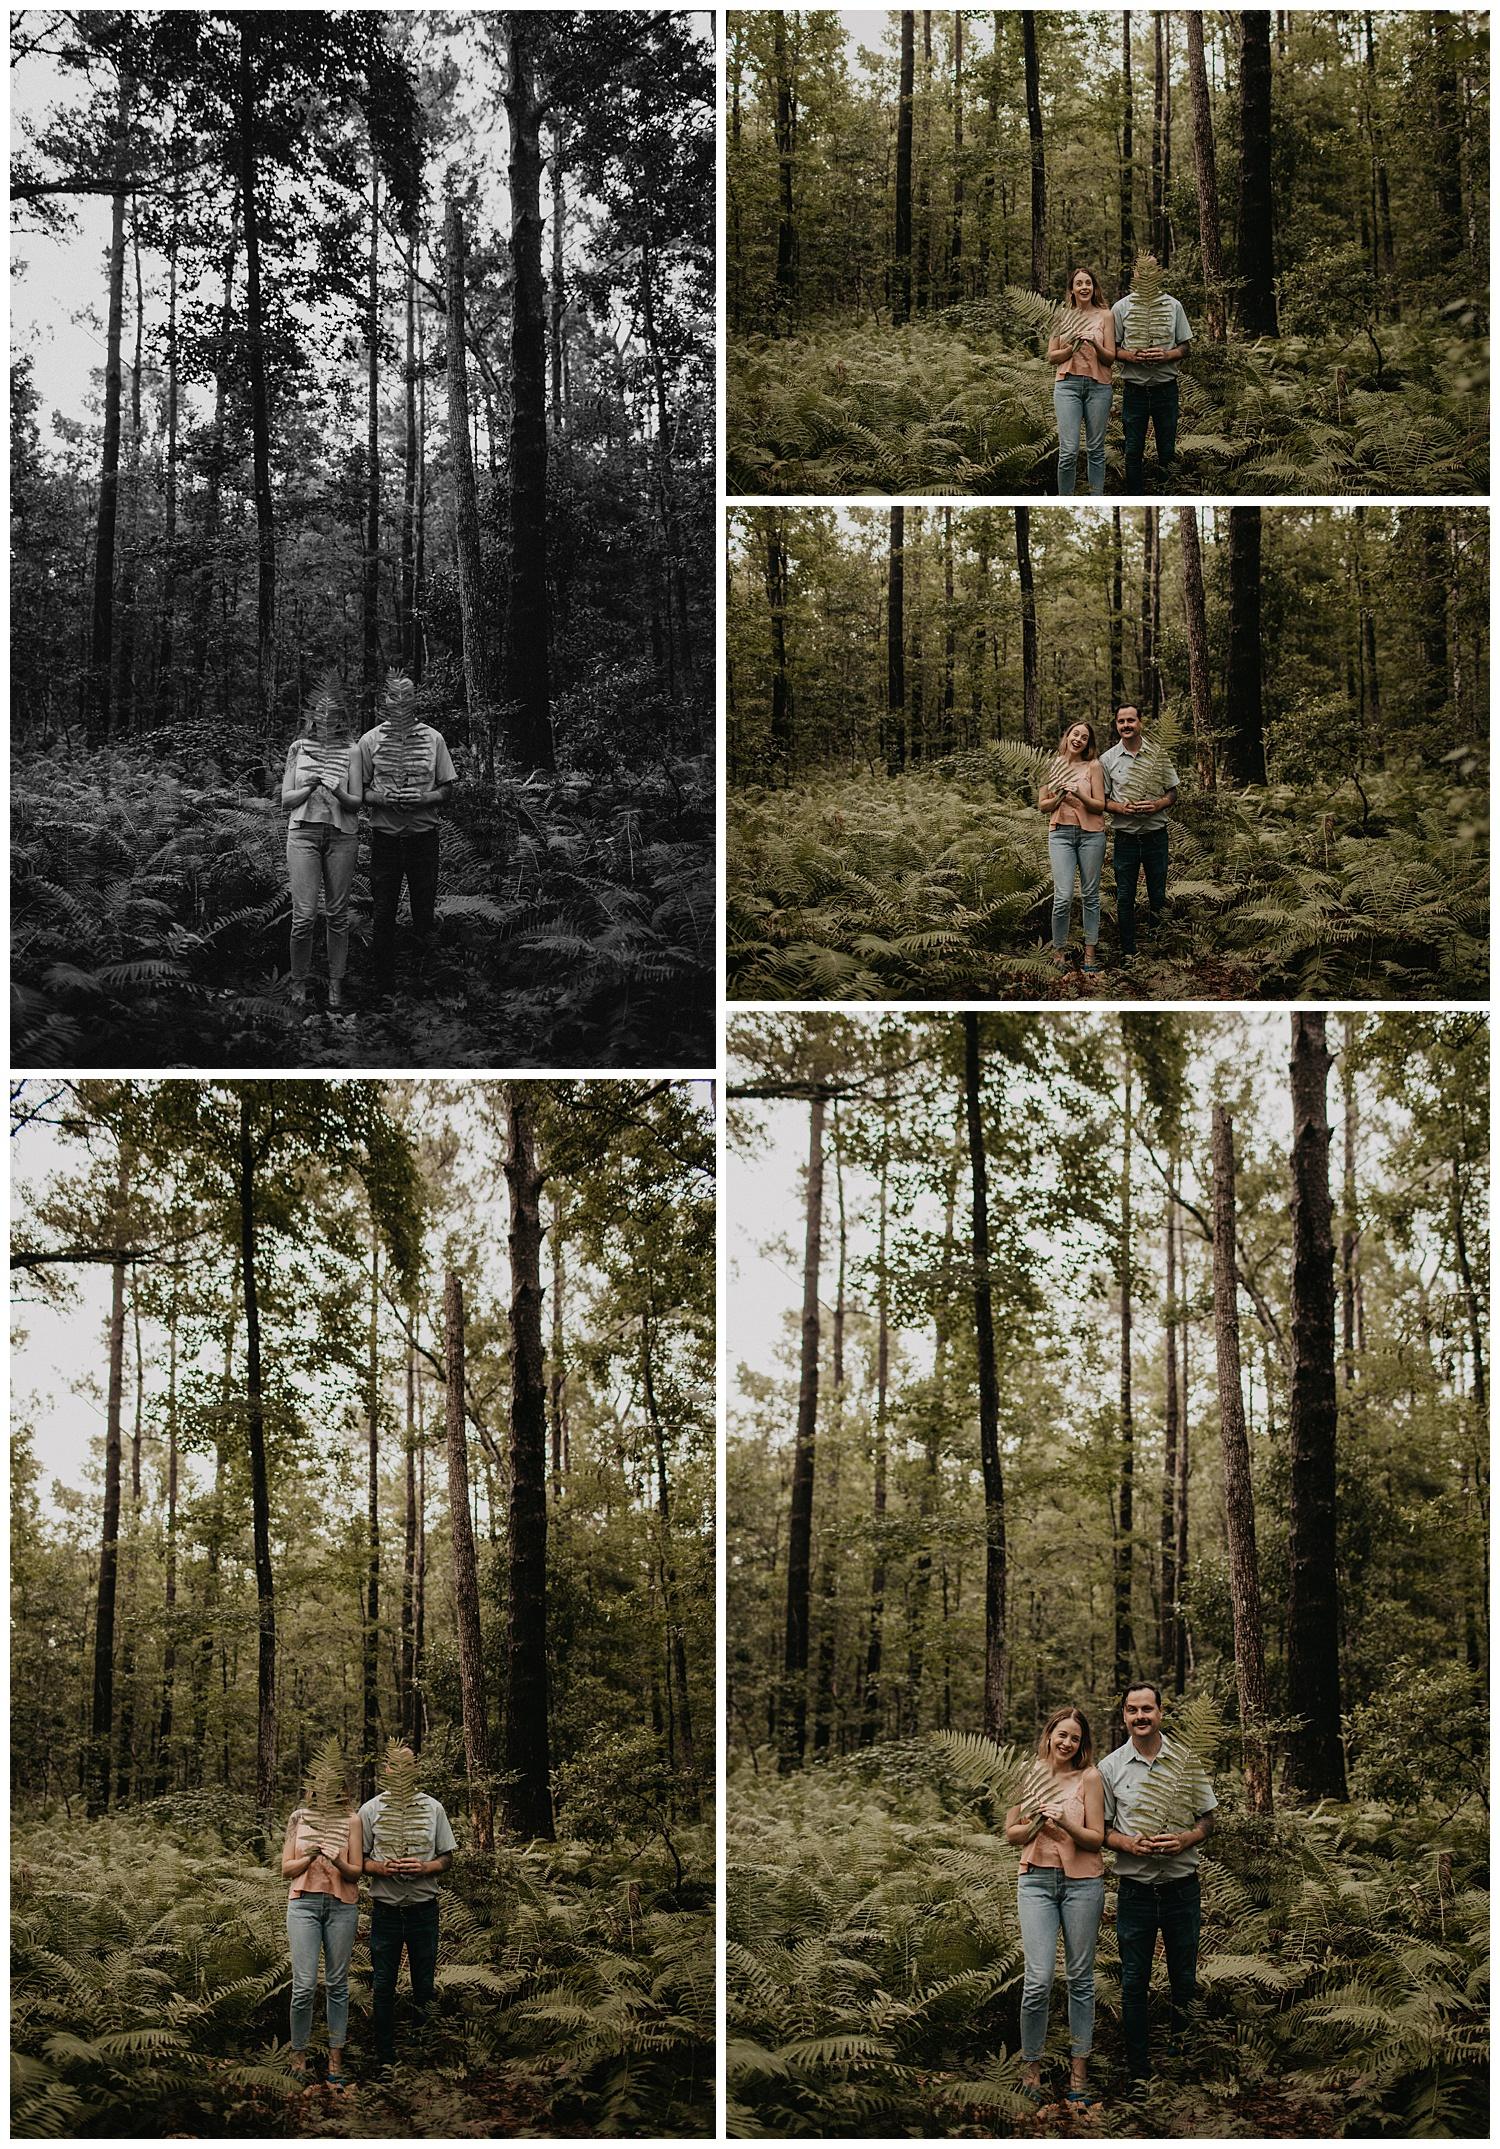 tillie-fowler-park-engagement-jacksonville-florida_0683.jpg